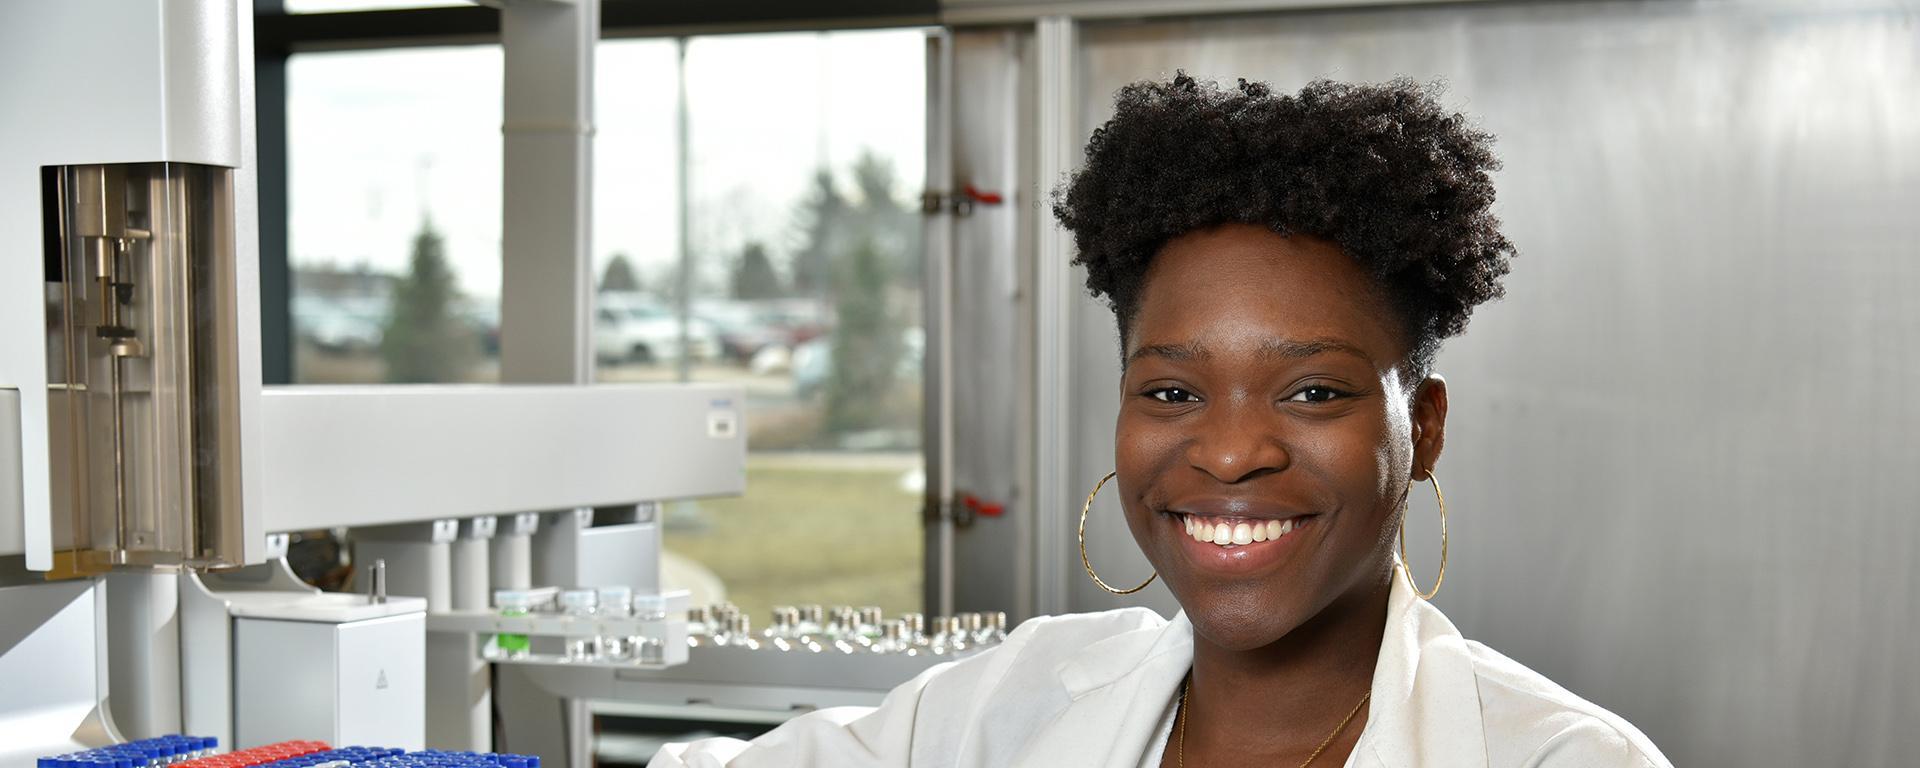 Jennifer Ofodile working in a biochemistry lab